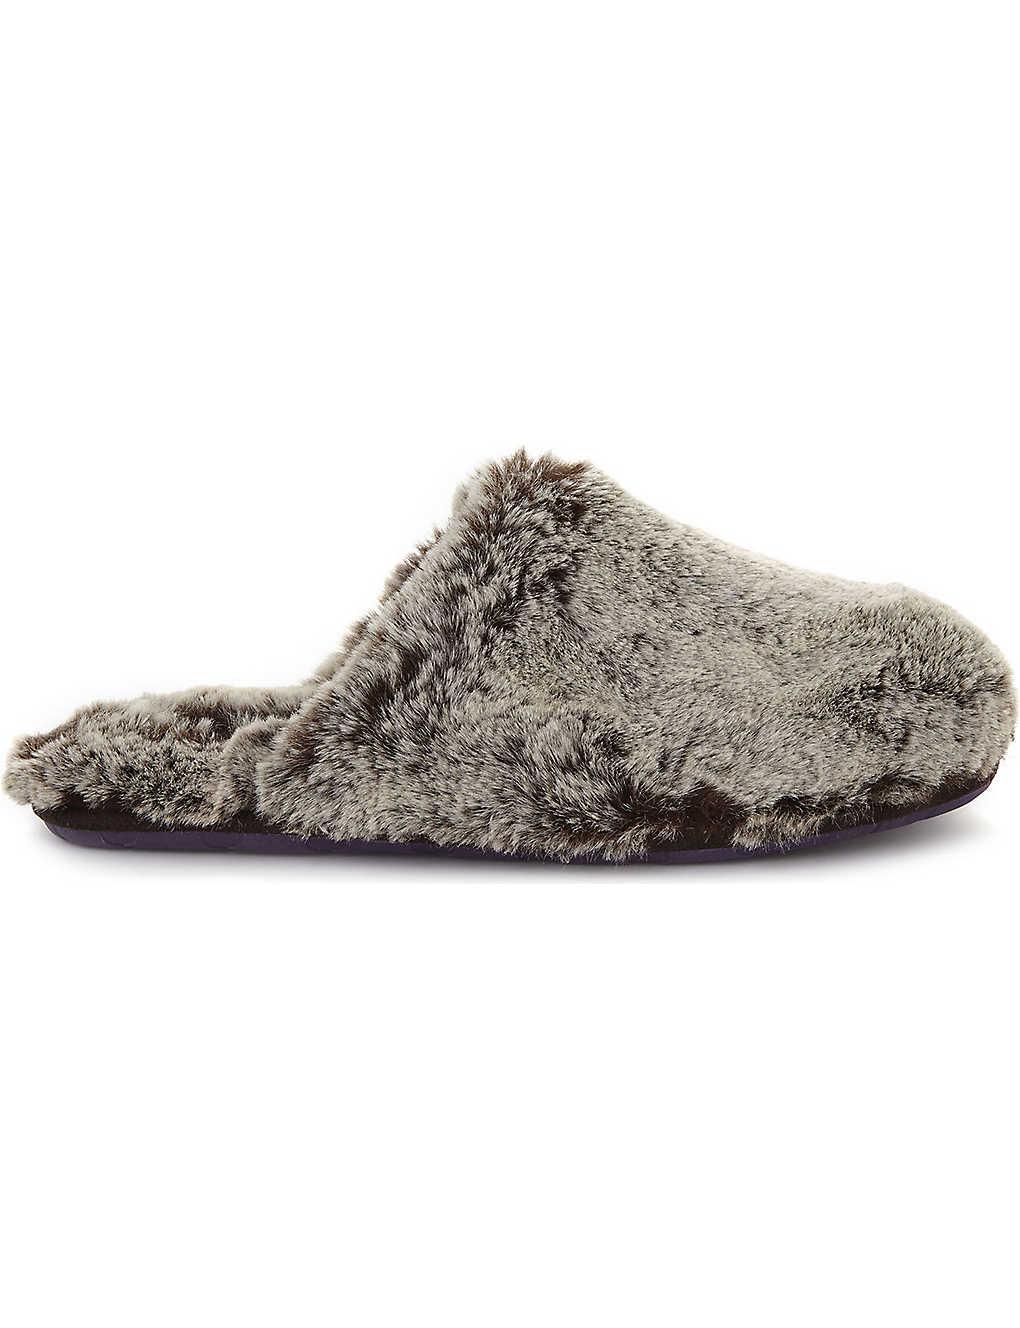 1959cfda67fdf0 TED BAKER - Nnyah faux-fur slippers